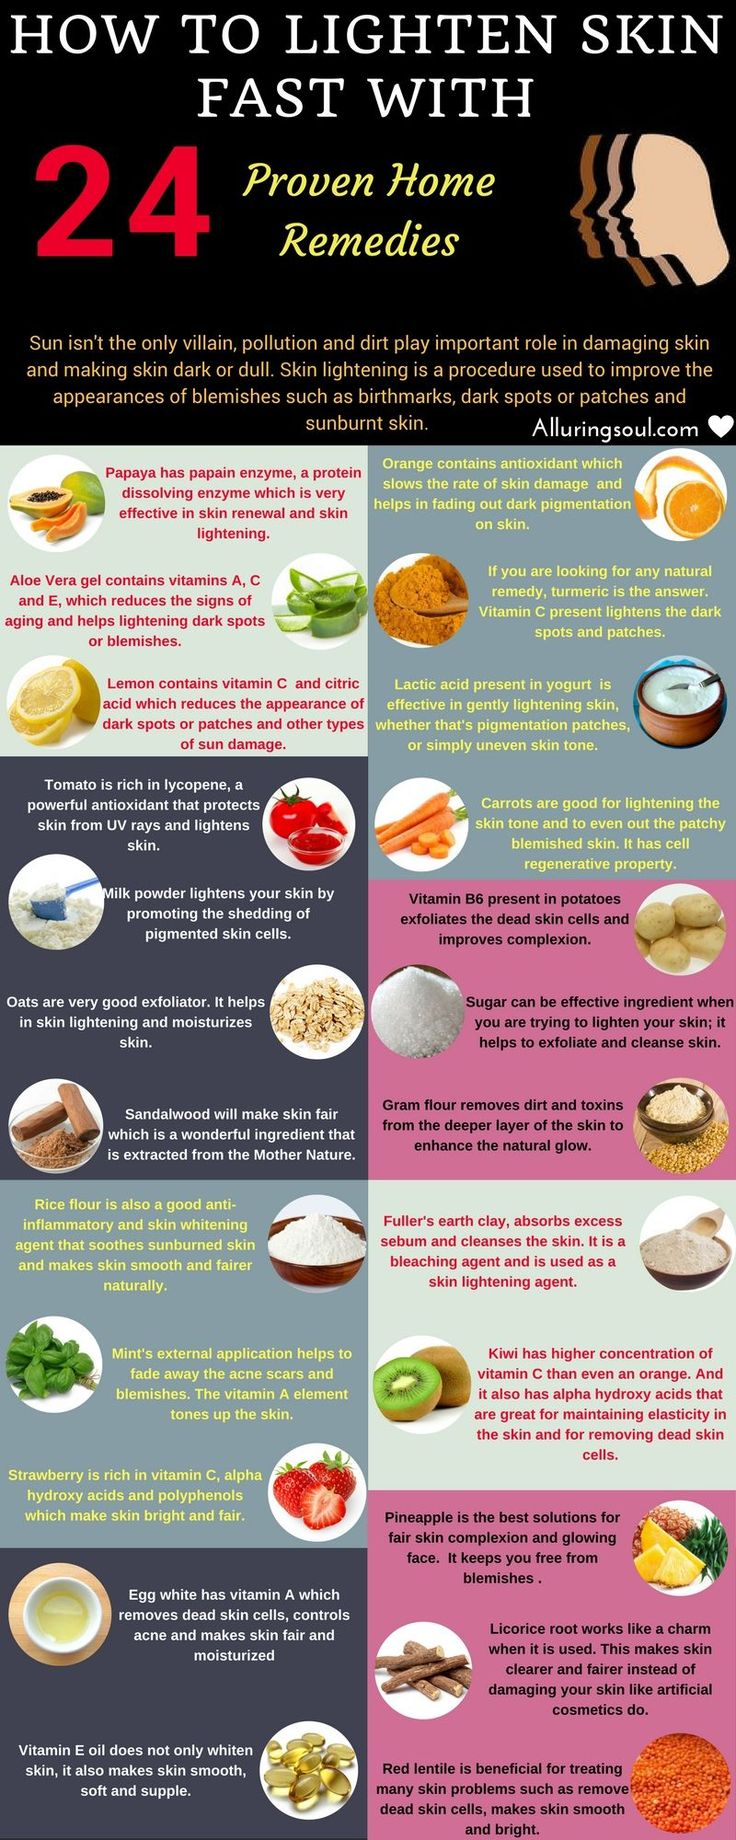 Best 25 lighten skin naturally ideas on pinterest lighten skin how to lighten skin fast 24 proven home remedies ccuart Image collections